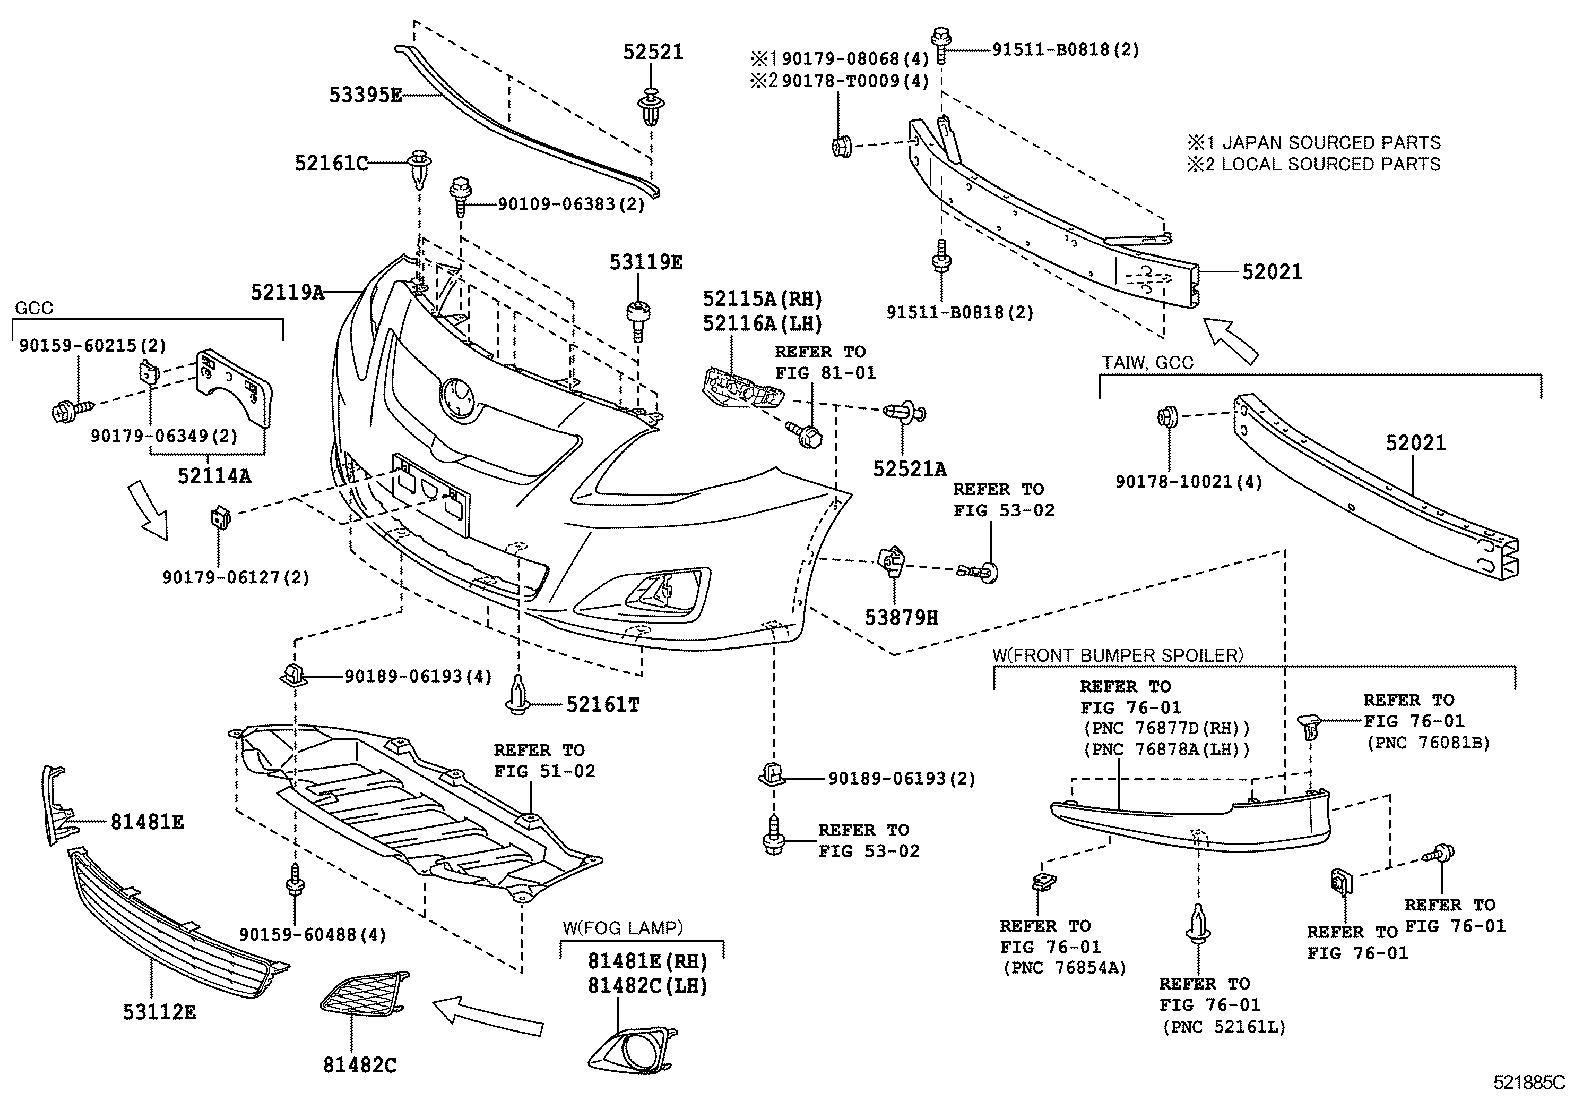 33 1999 Toyota Corolla Exhaust System Diagram